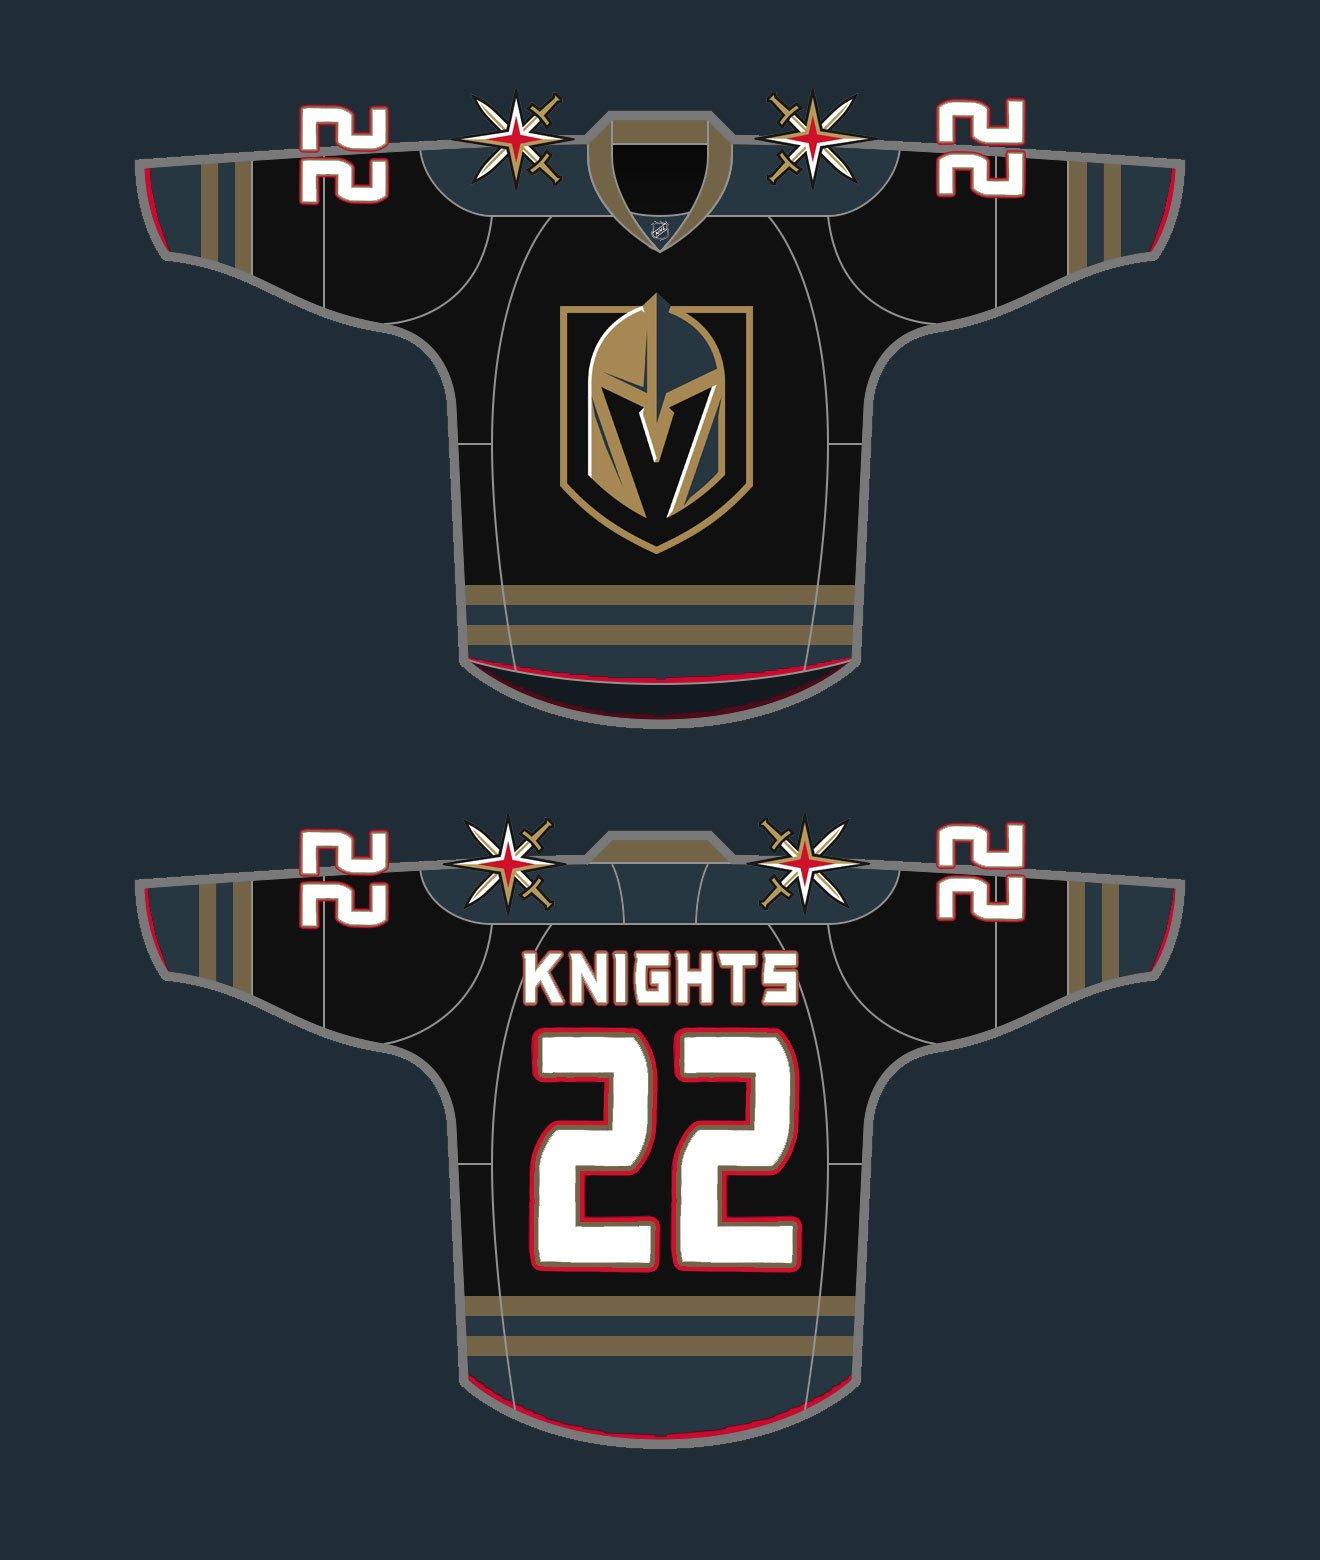 Vegas Golden Knights Jersey Concepts - SinBin.vegas ae2270f4f